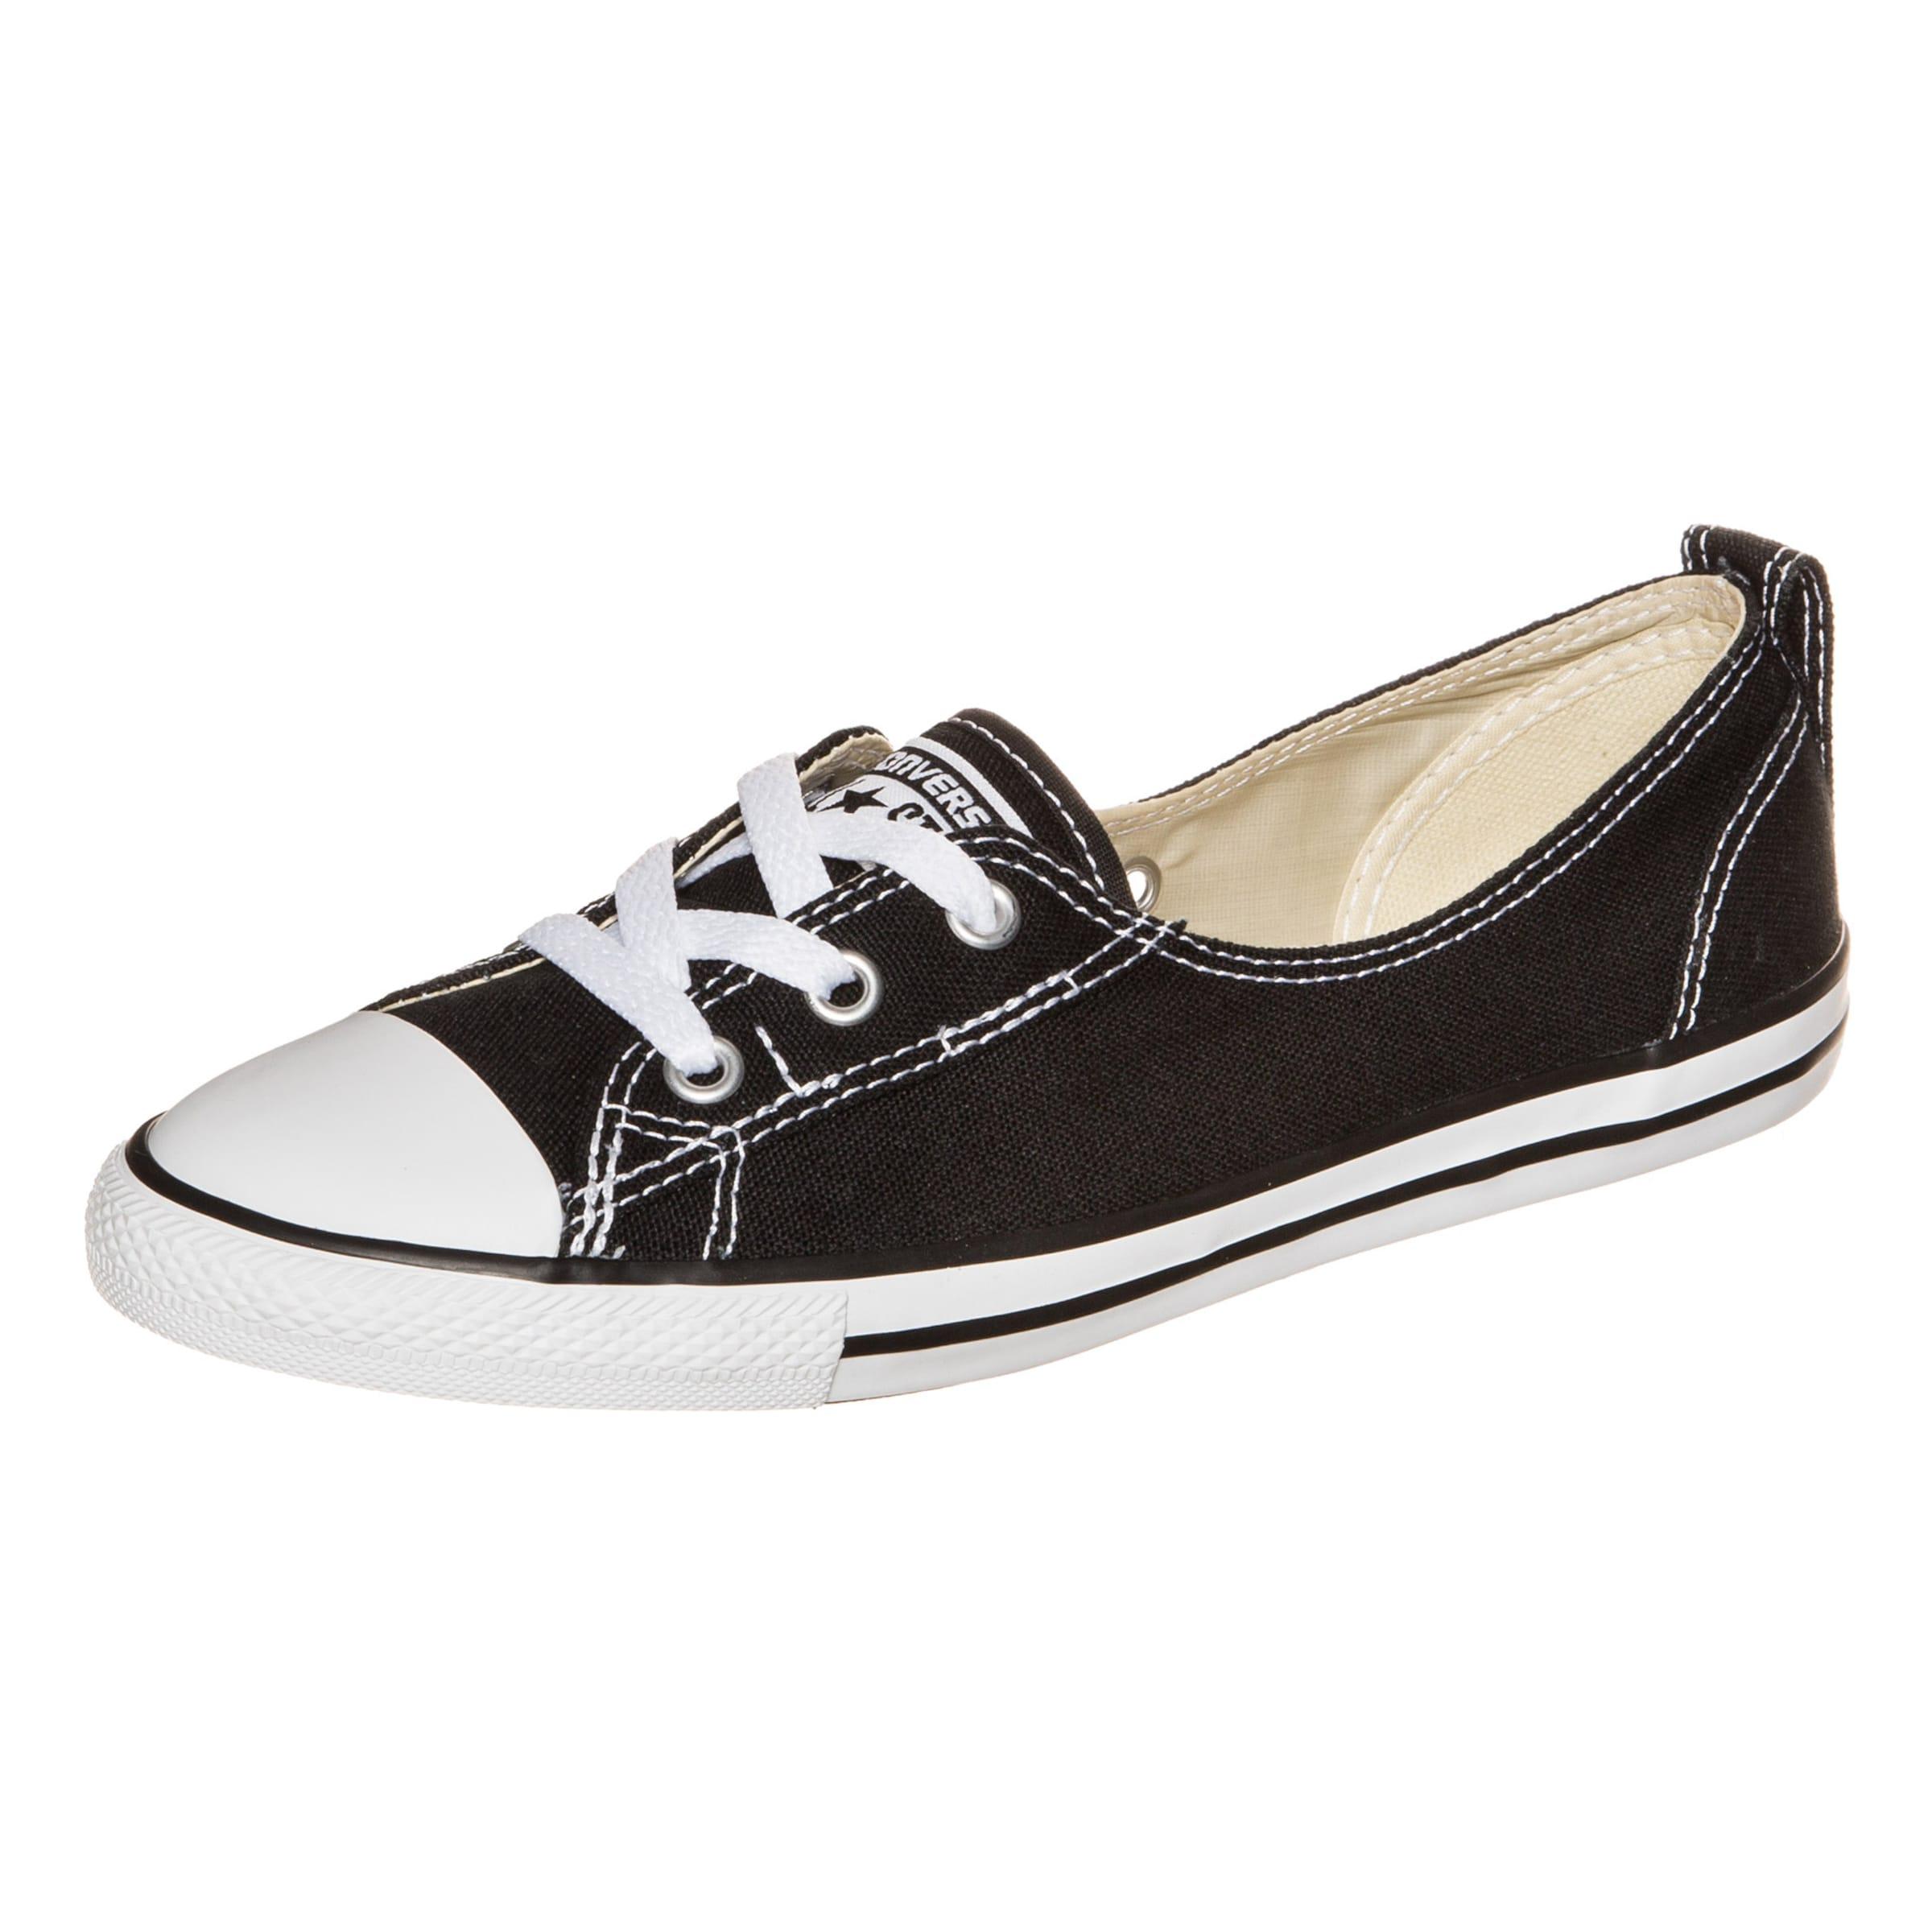 Chuck Ballet In Schwarz Taylor Sneaker Converse All Lace Star xBCeodr